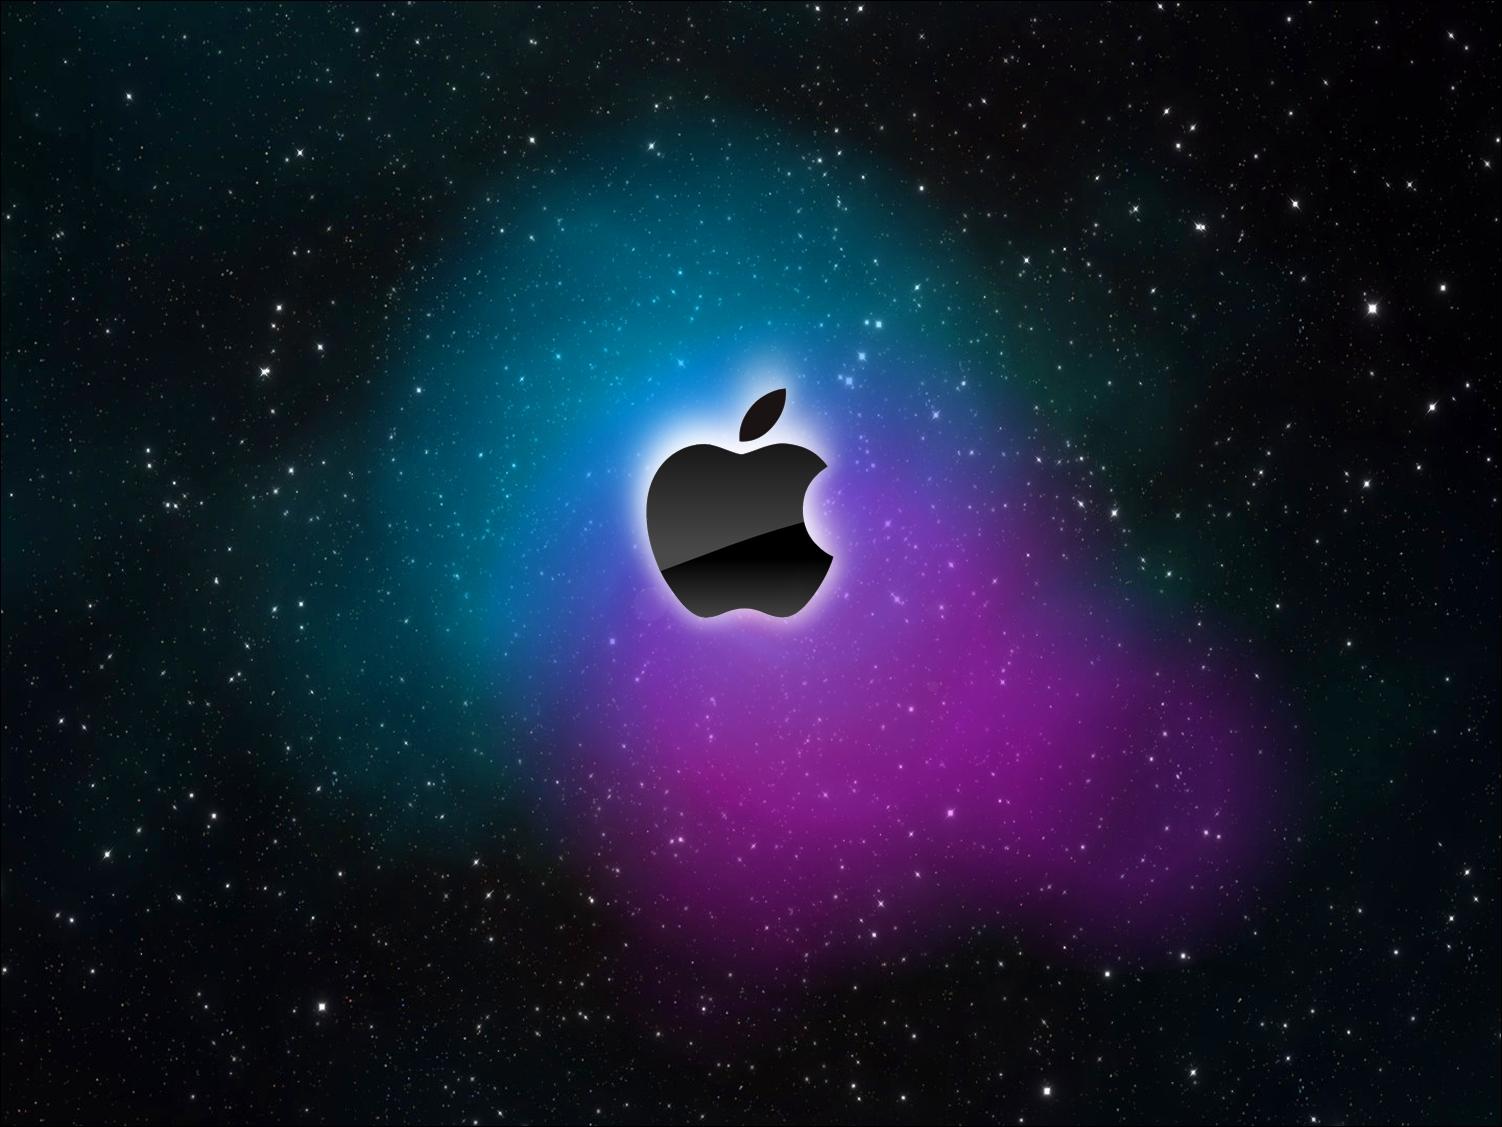 awesome mac backgrounds - wallpapersafari